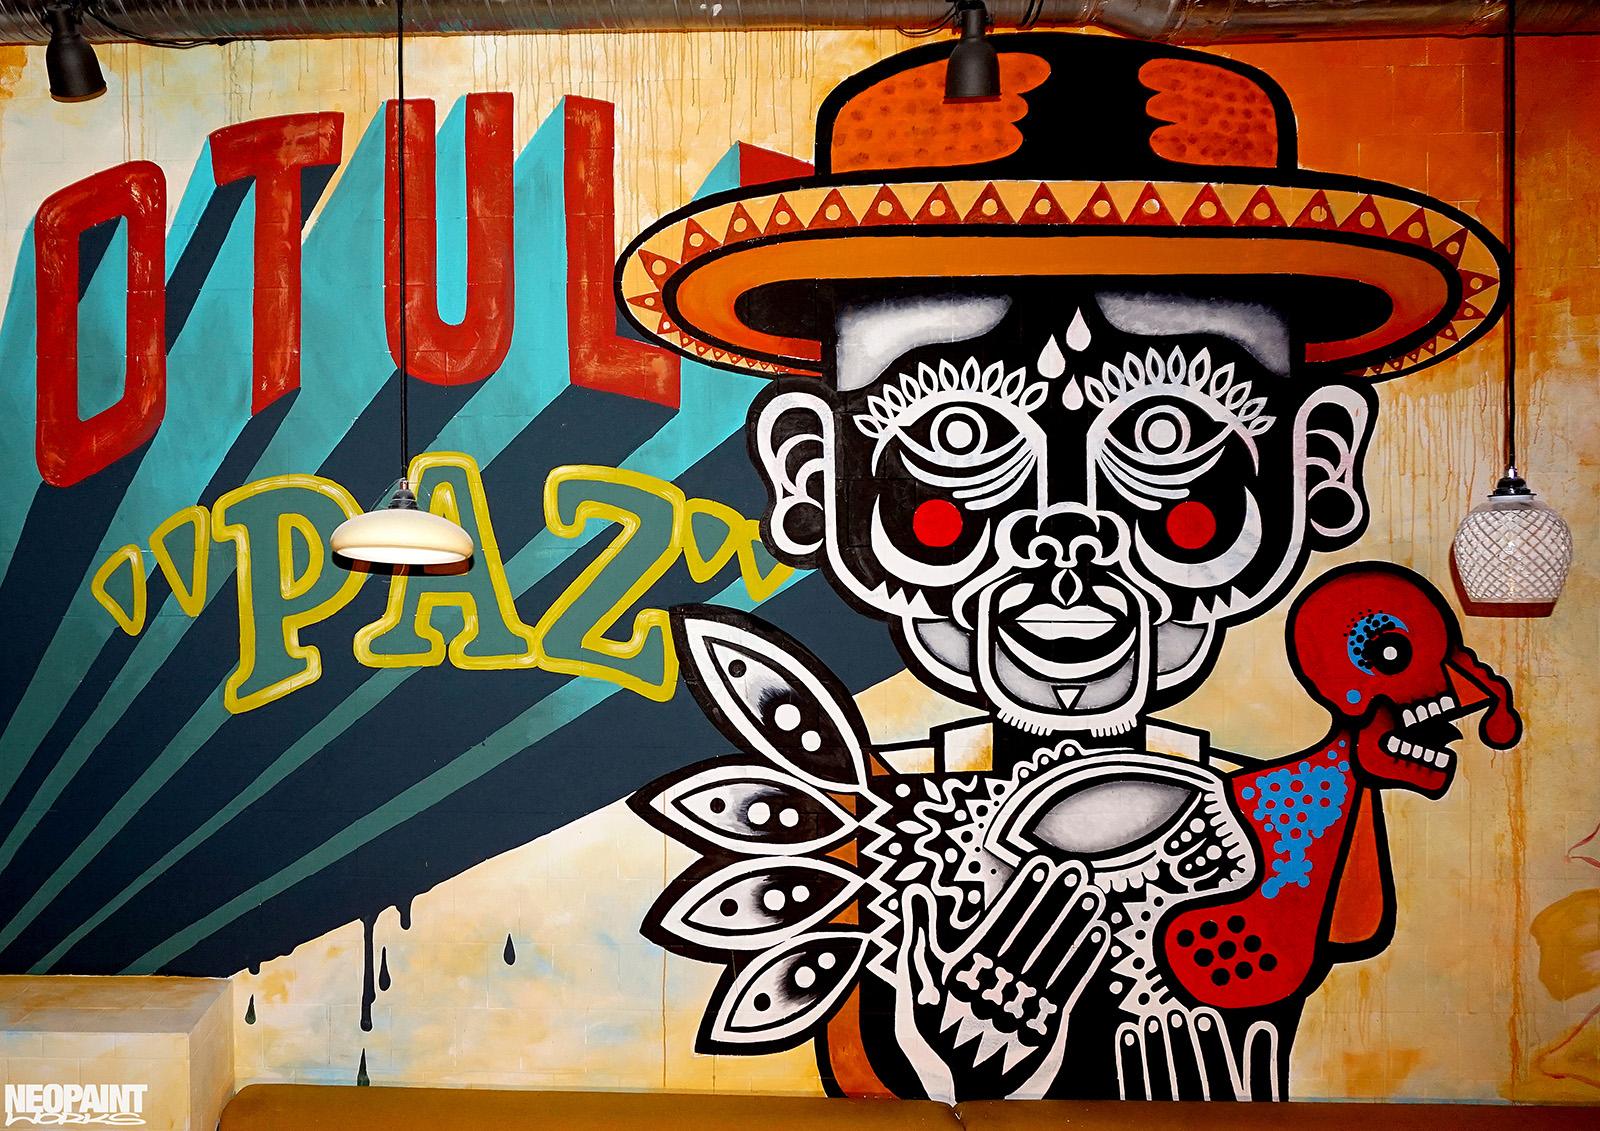 falfestmény - mexikói - graffiti - neopaint works - tereza -